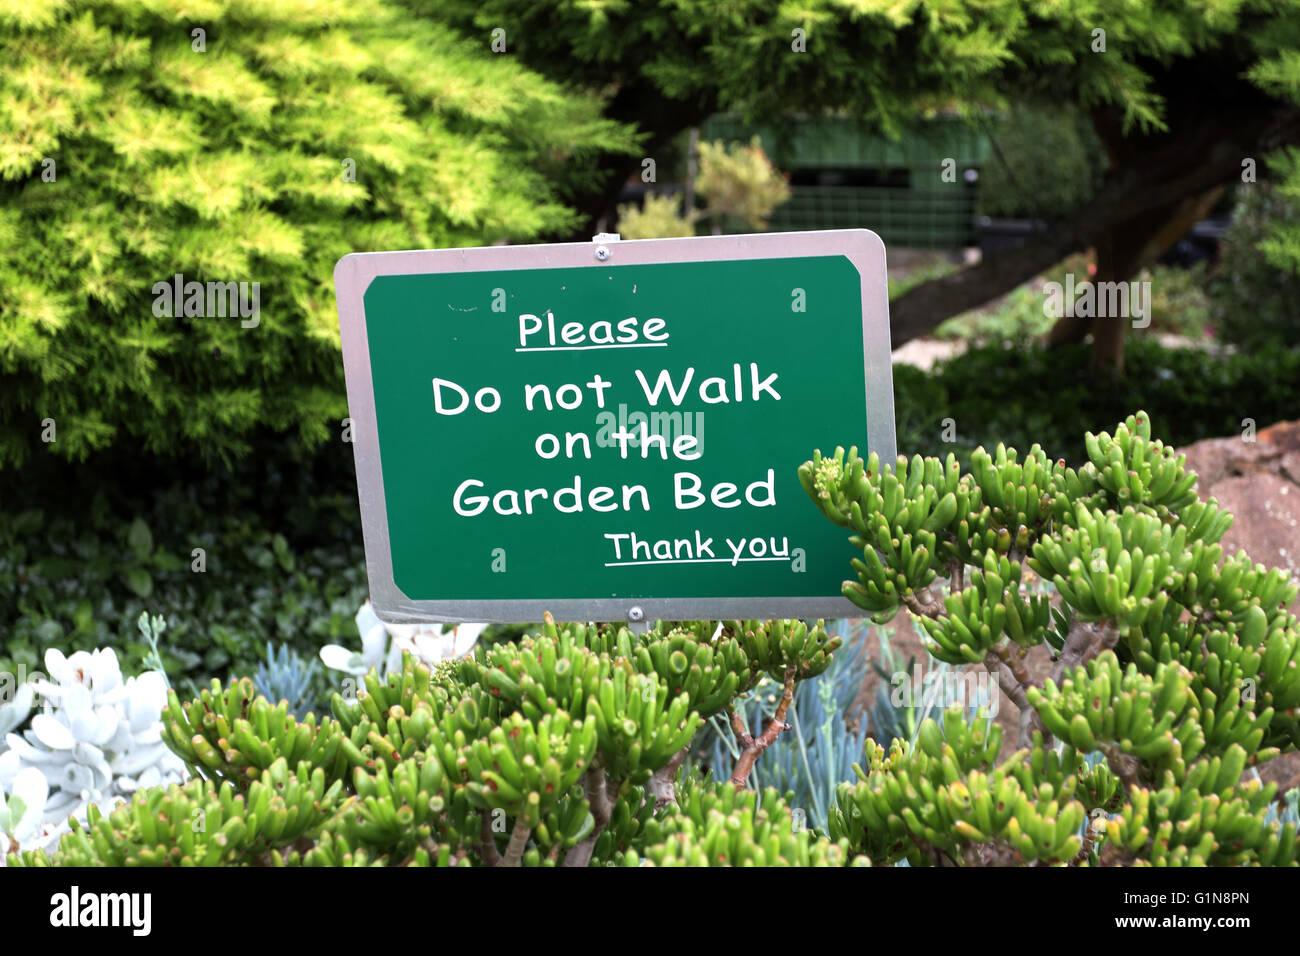 Do Not Walk On The Garden Bed Sign Near The Succulent Garden Stock Photo Alamy